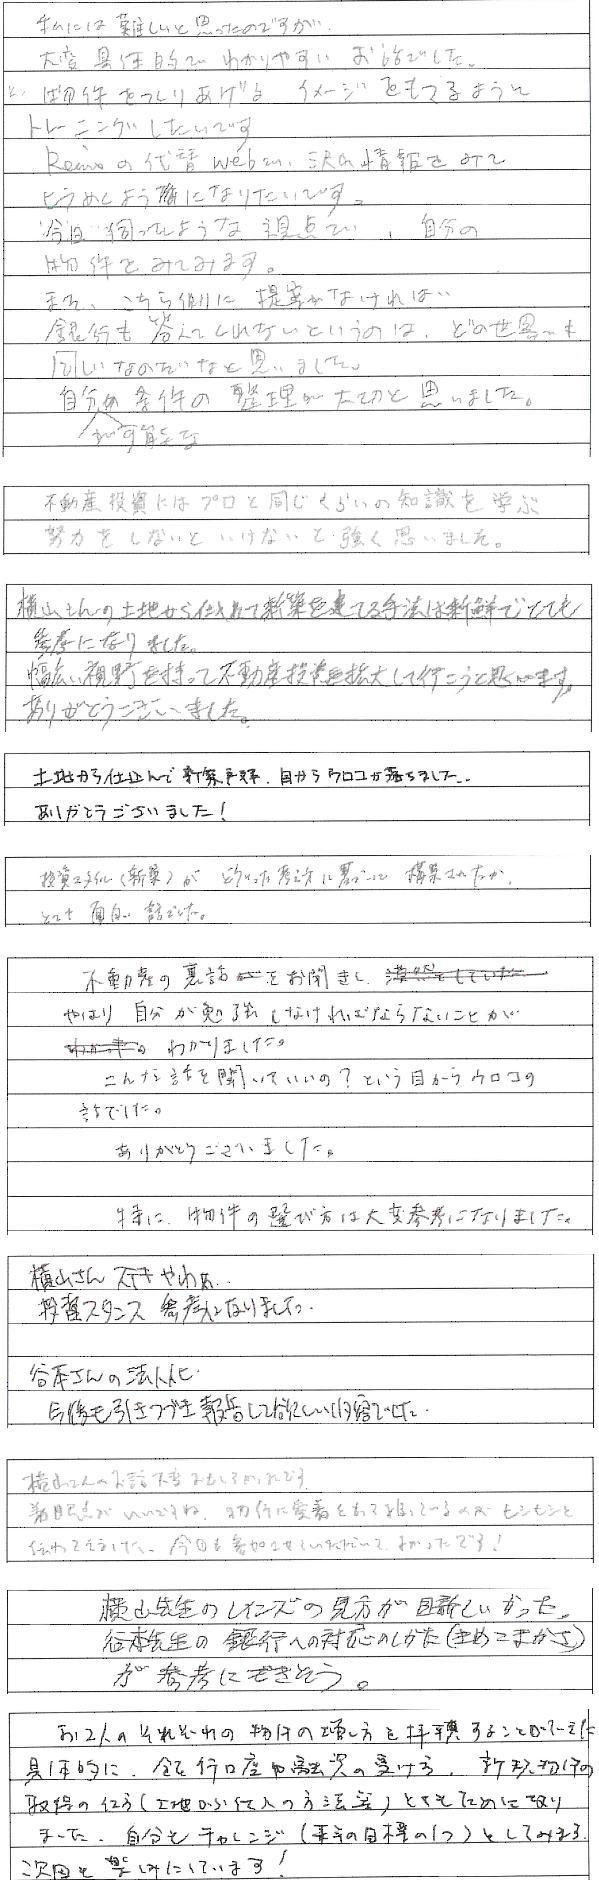 kanso_1_small_2013_10_19.jpg